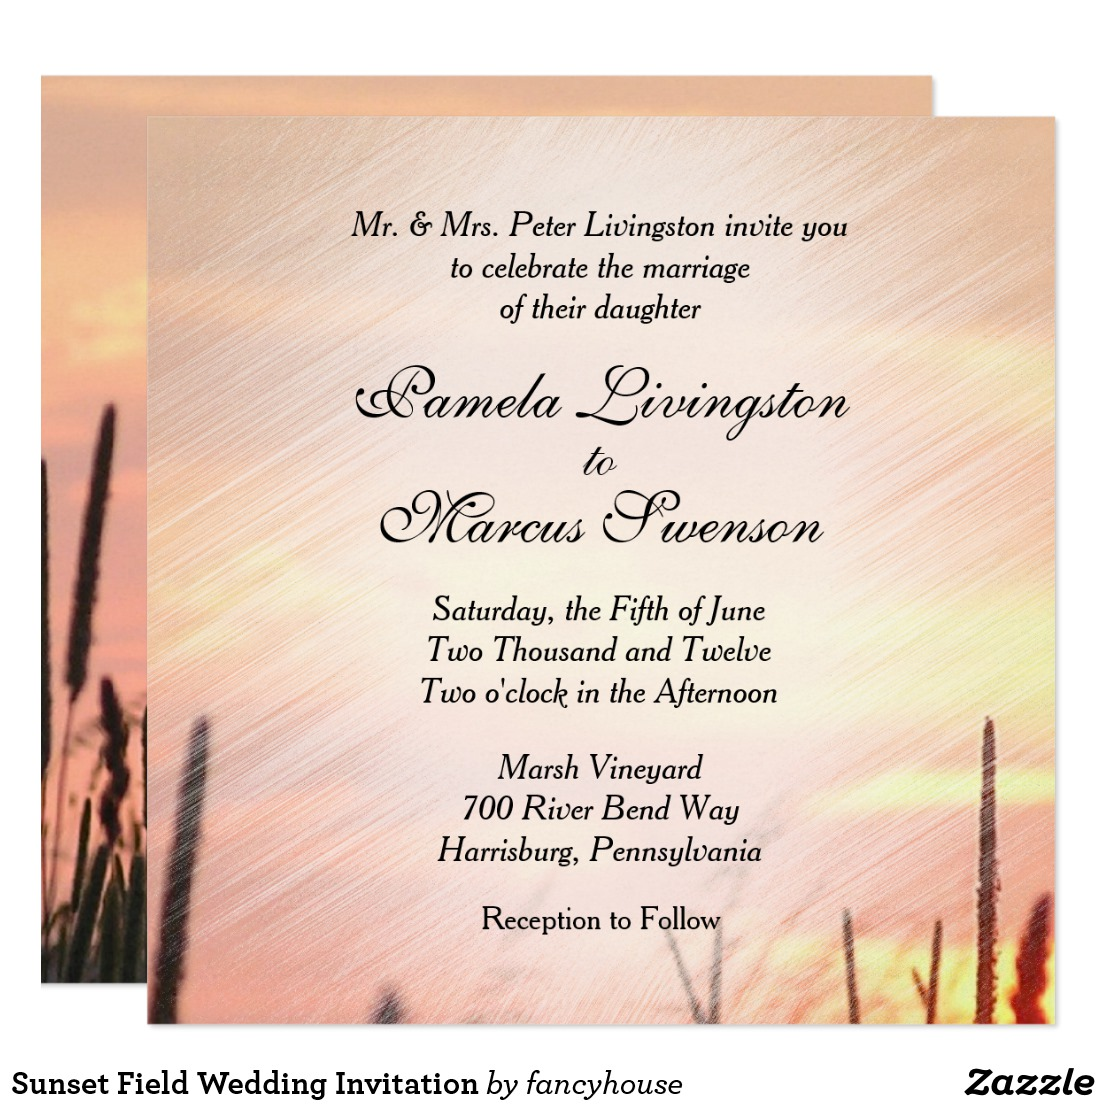 Sunset Field Wedding Invitation